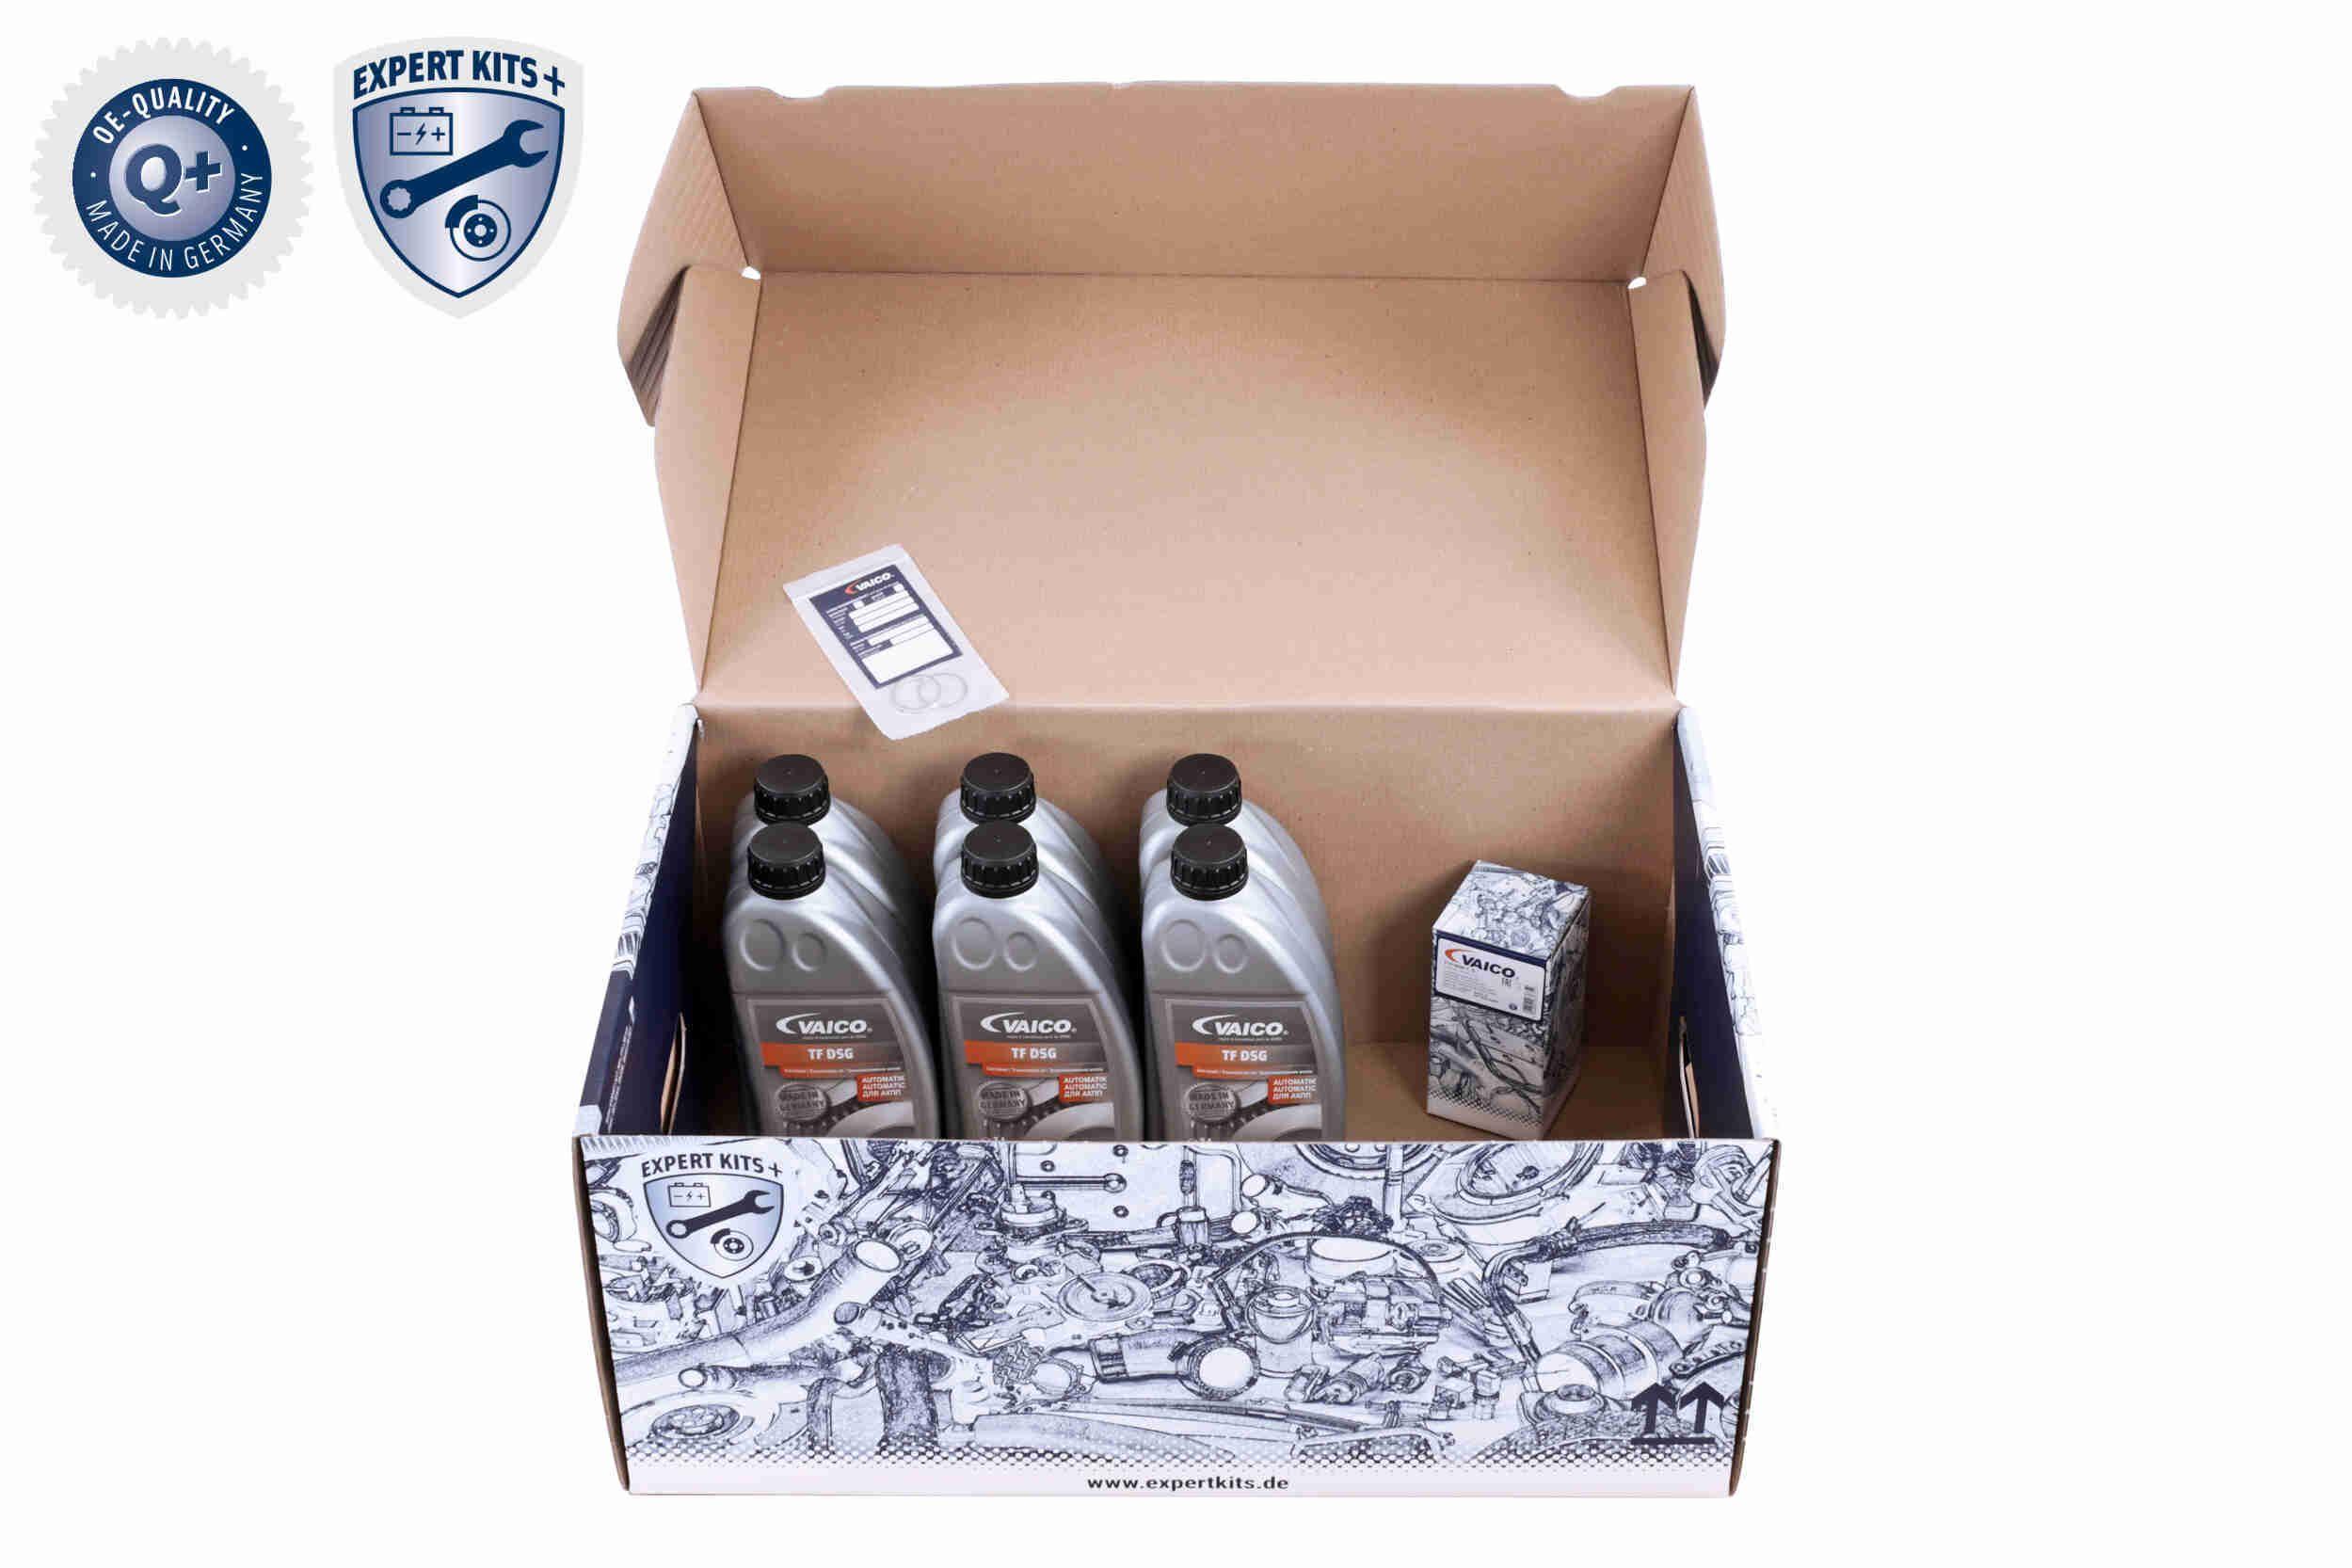 V10-3025 Ölwechselkit Automatikgetriebe VAICO Erfahrung